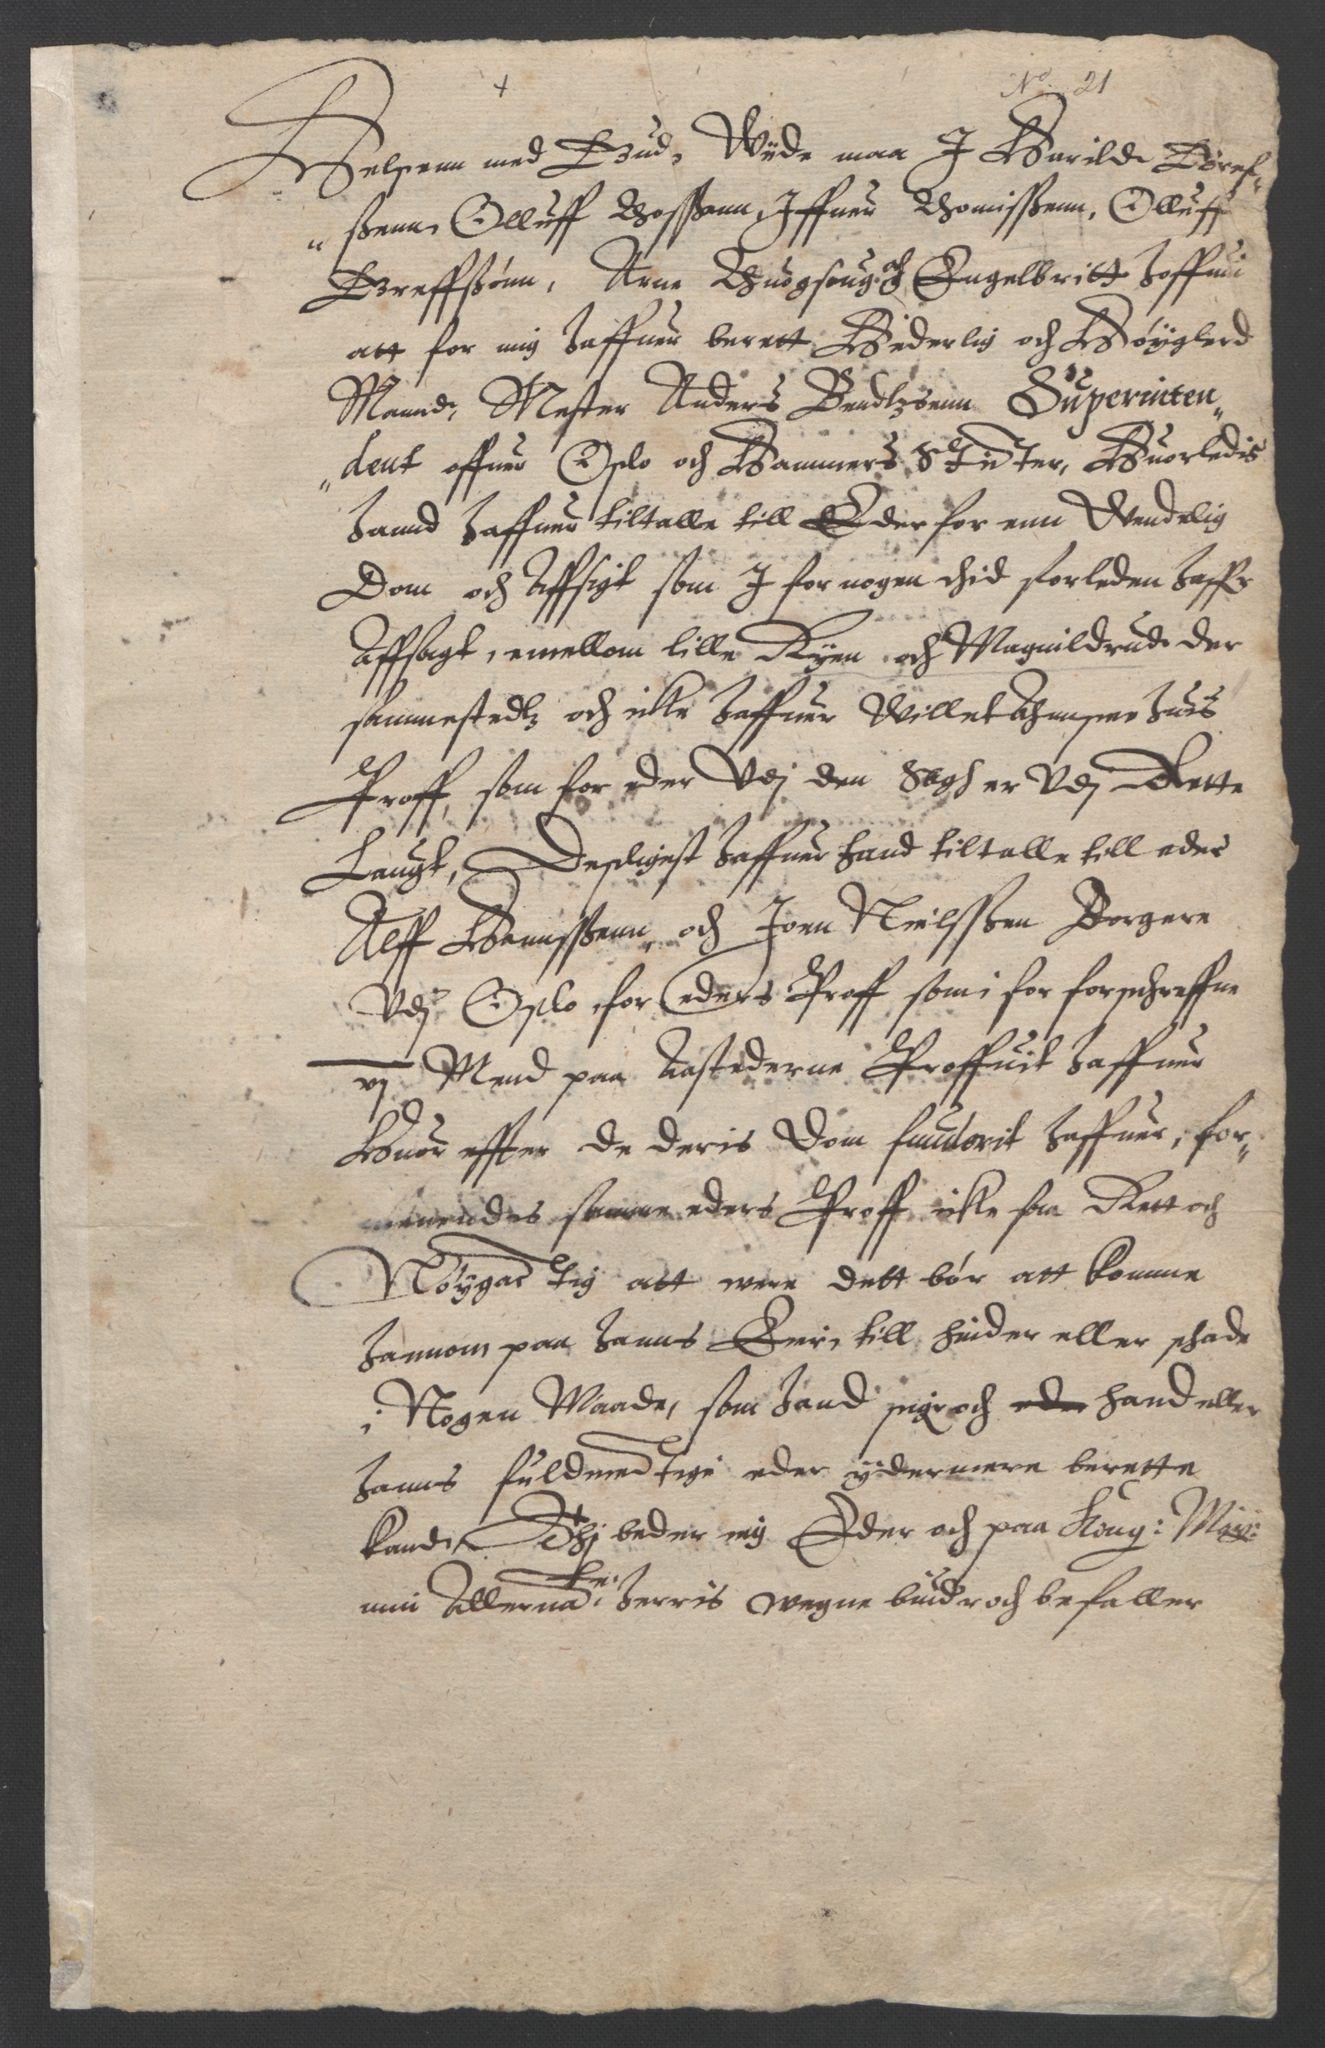 SAO, Oslo stiftsdireksjon, G/Gb/L0001: Bispestolens dokumenter, 1584-1612, s. 21